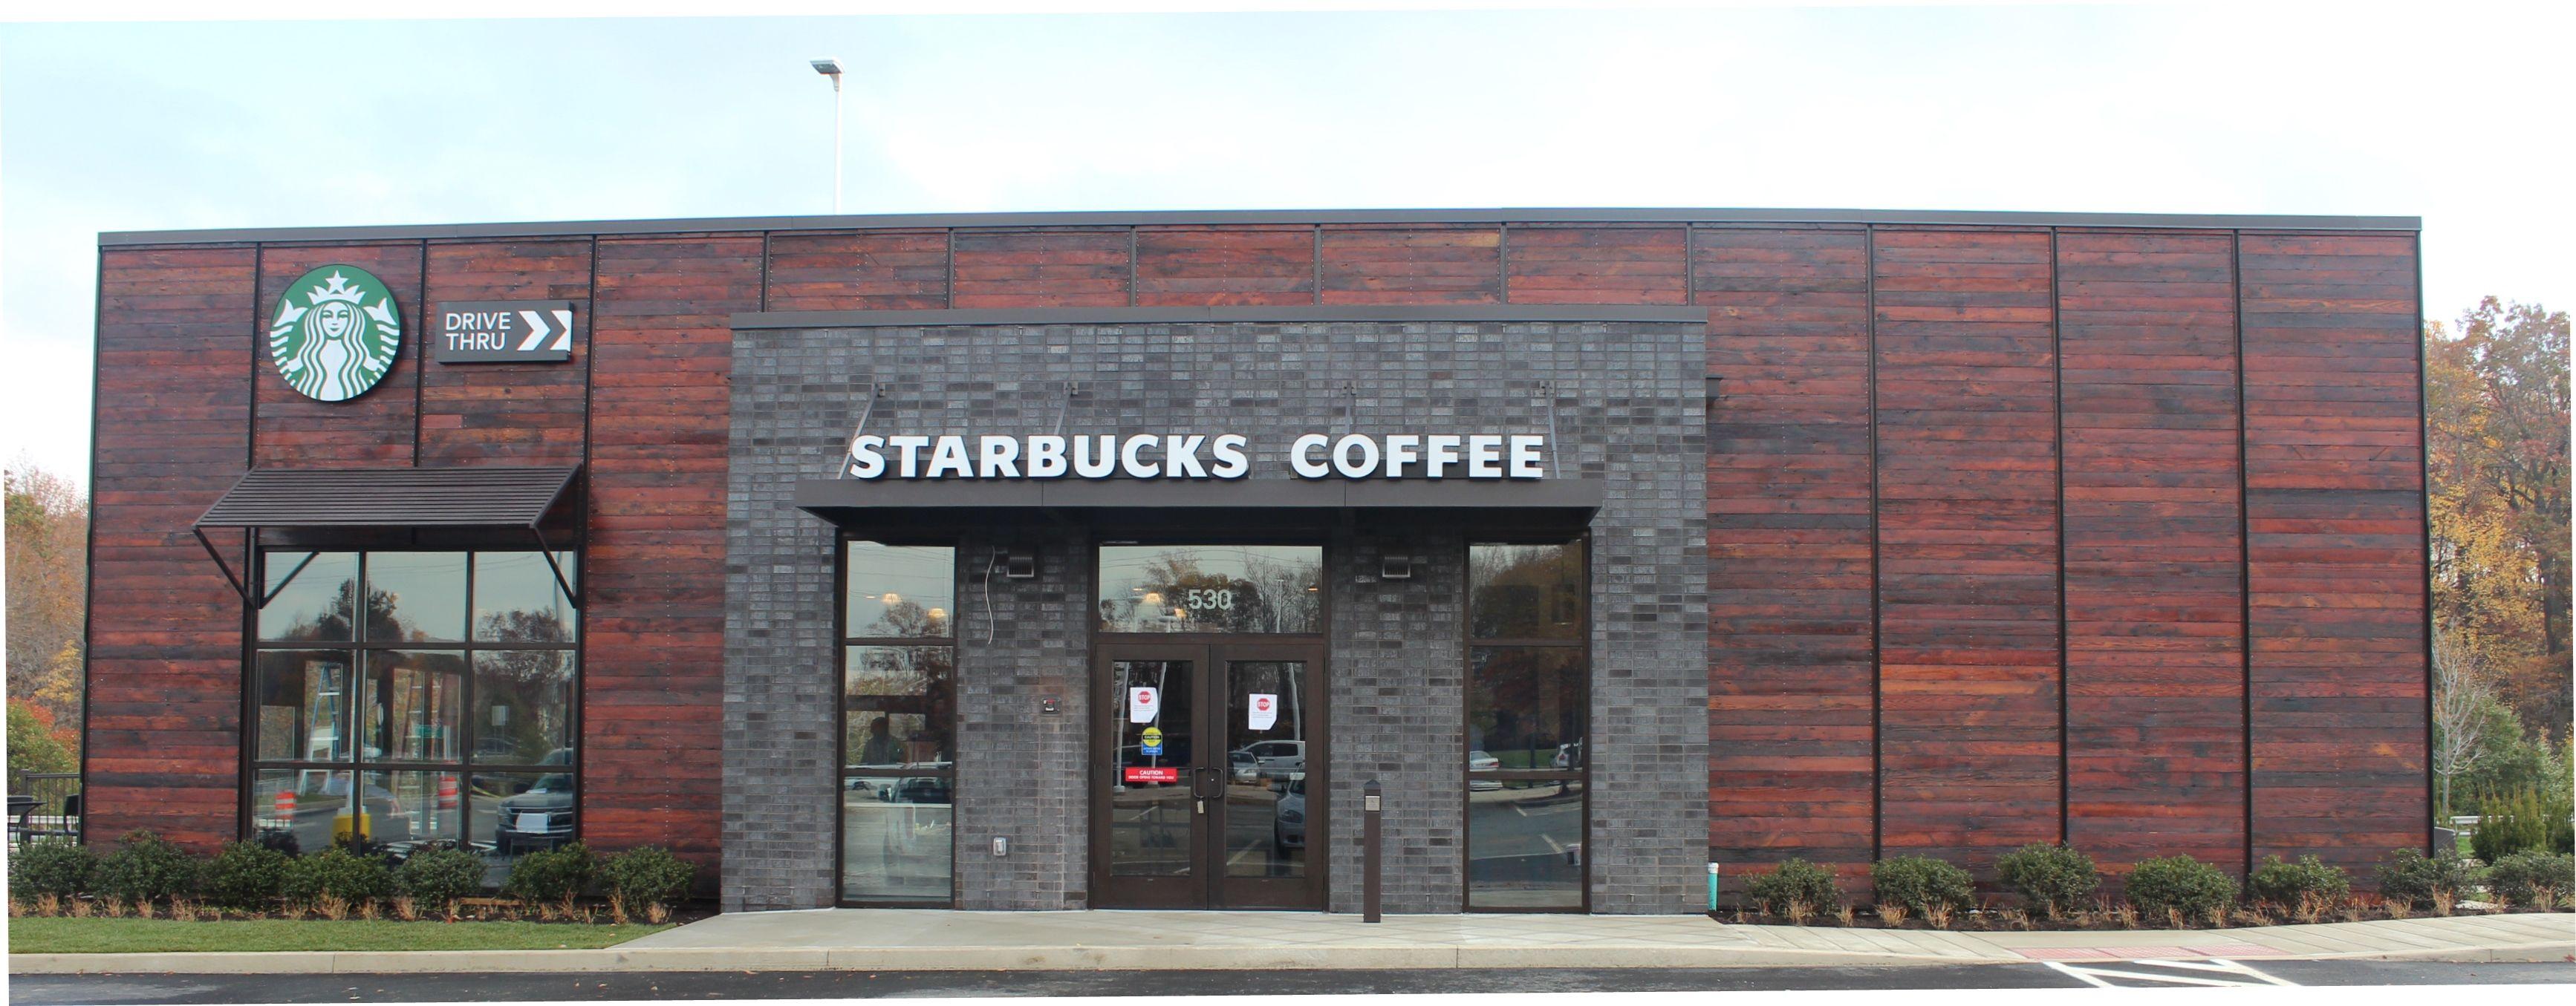 Hmshost Opens New Drive Thru Starbucks At Delaware Welcome Center On I 95